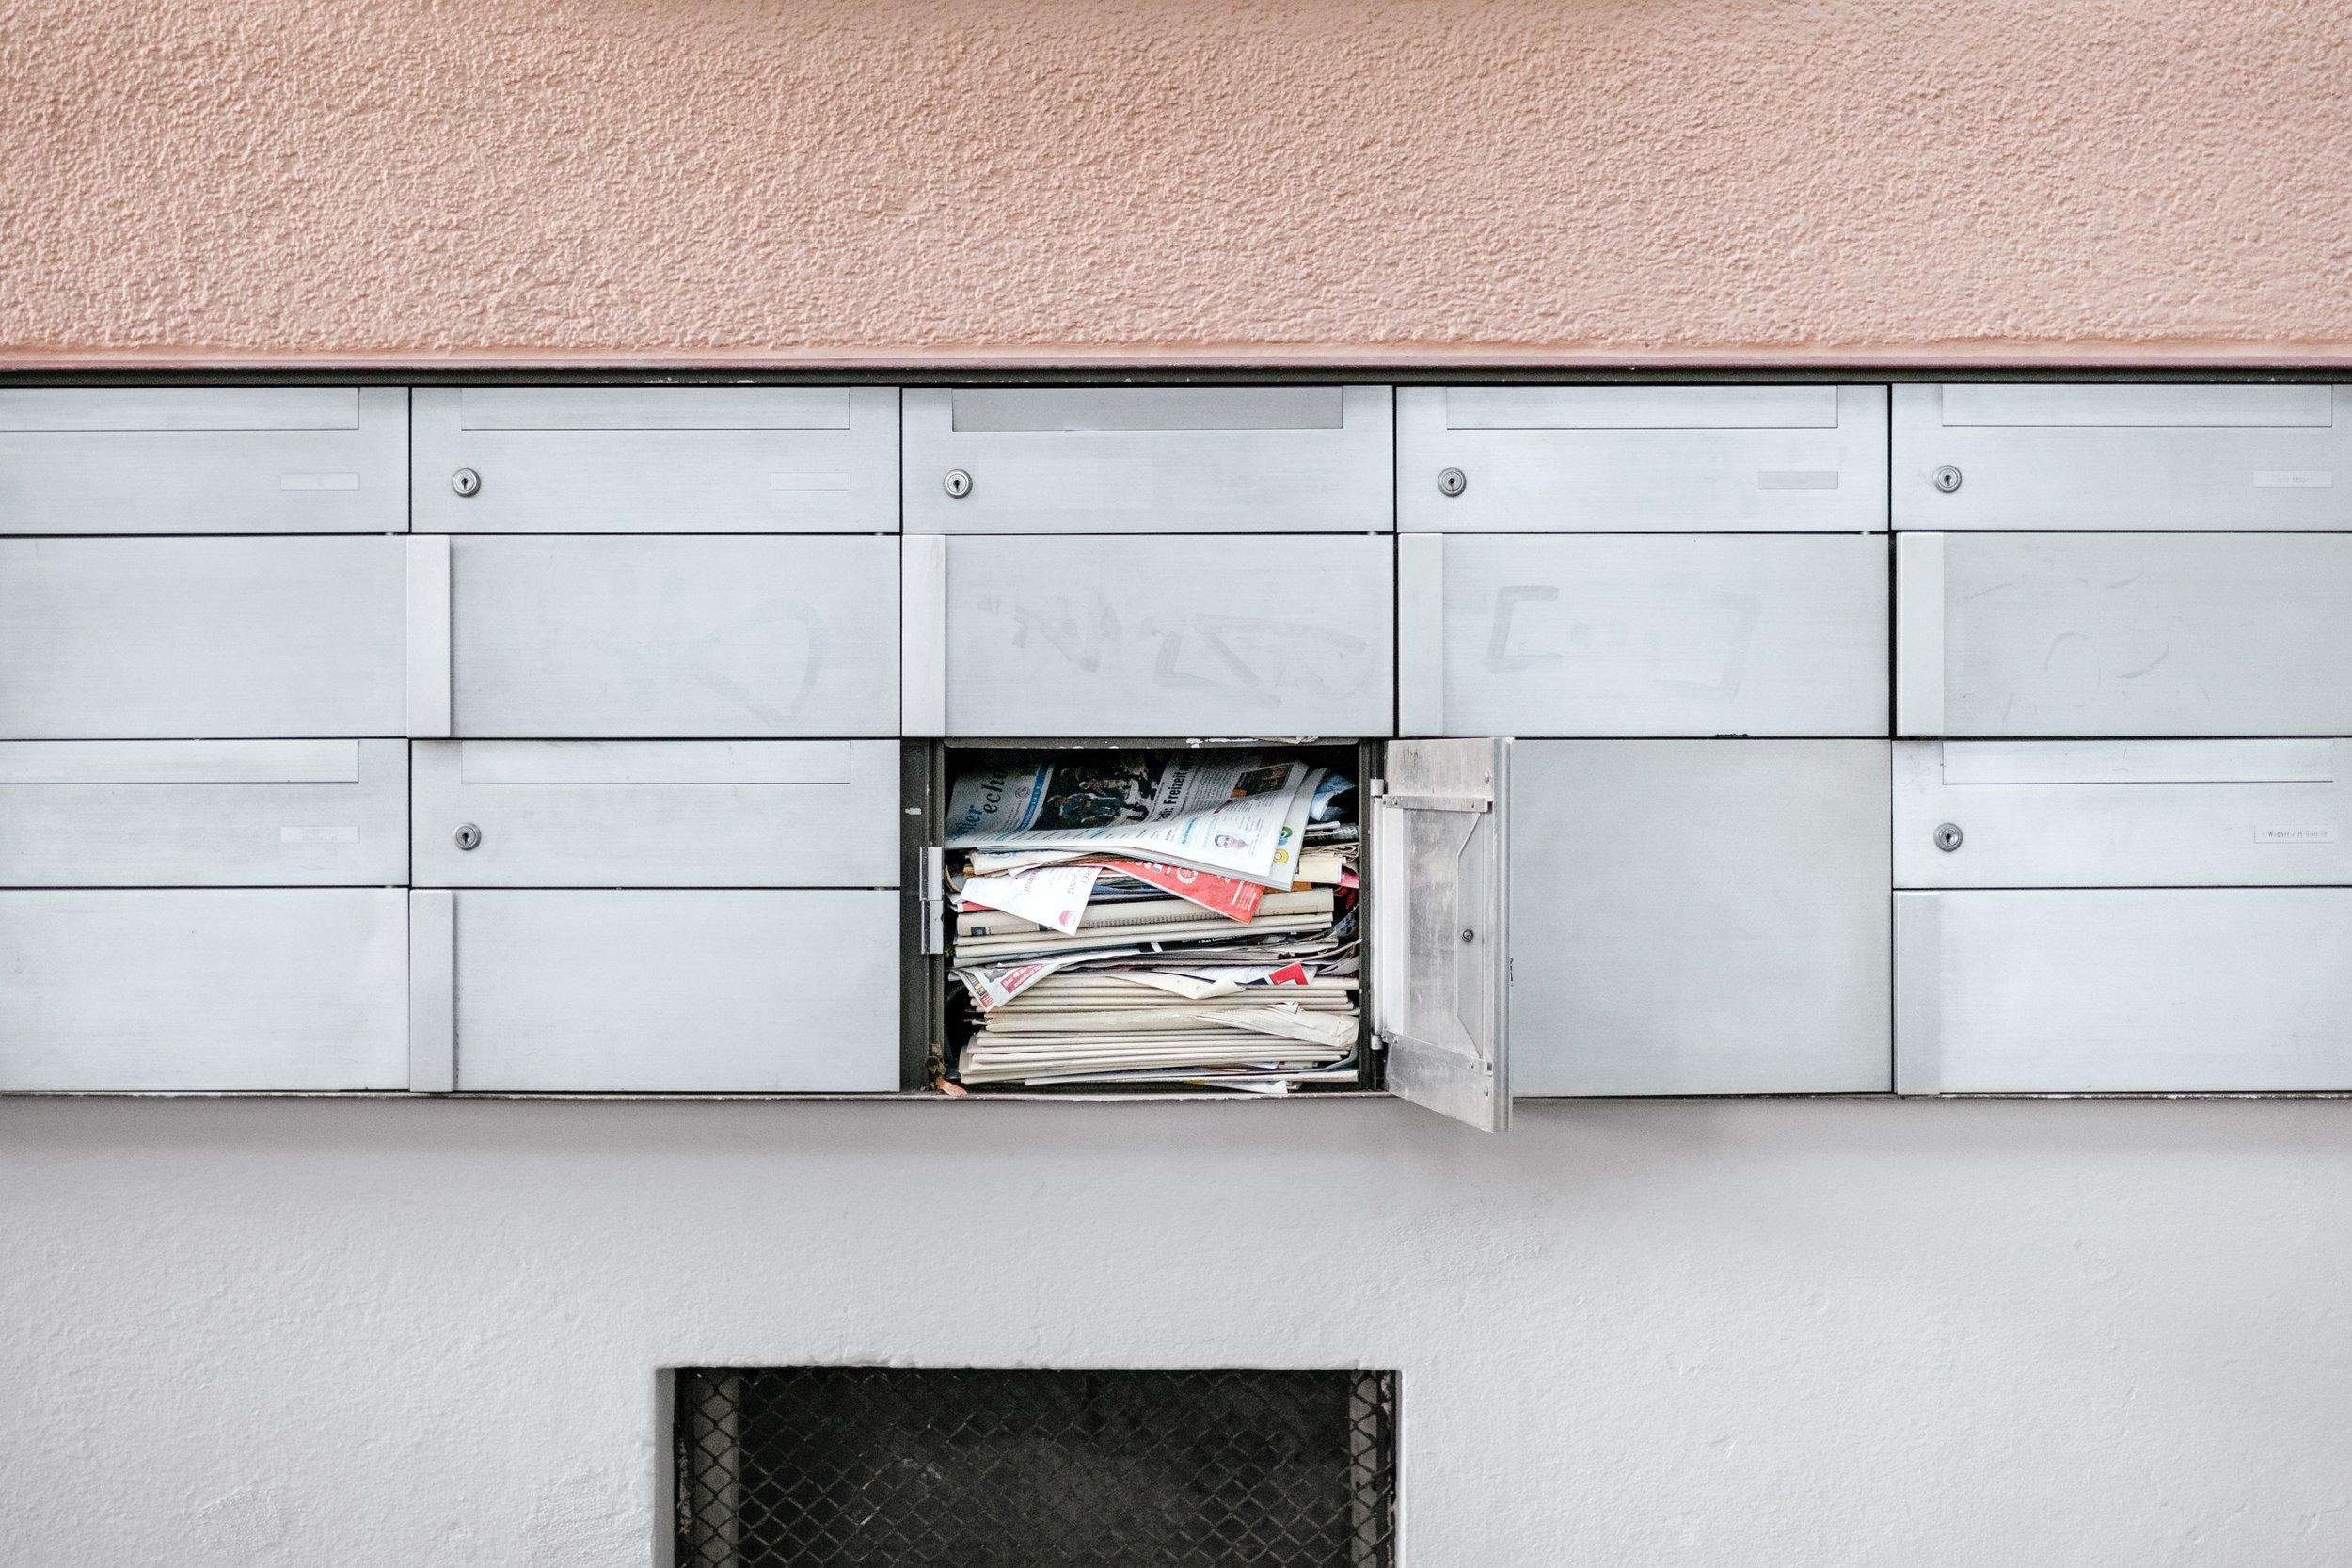 Overvolle mailbox - vakantie stress